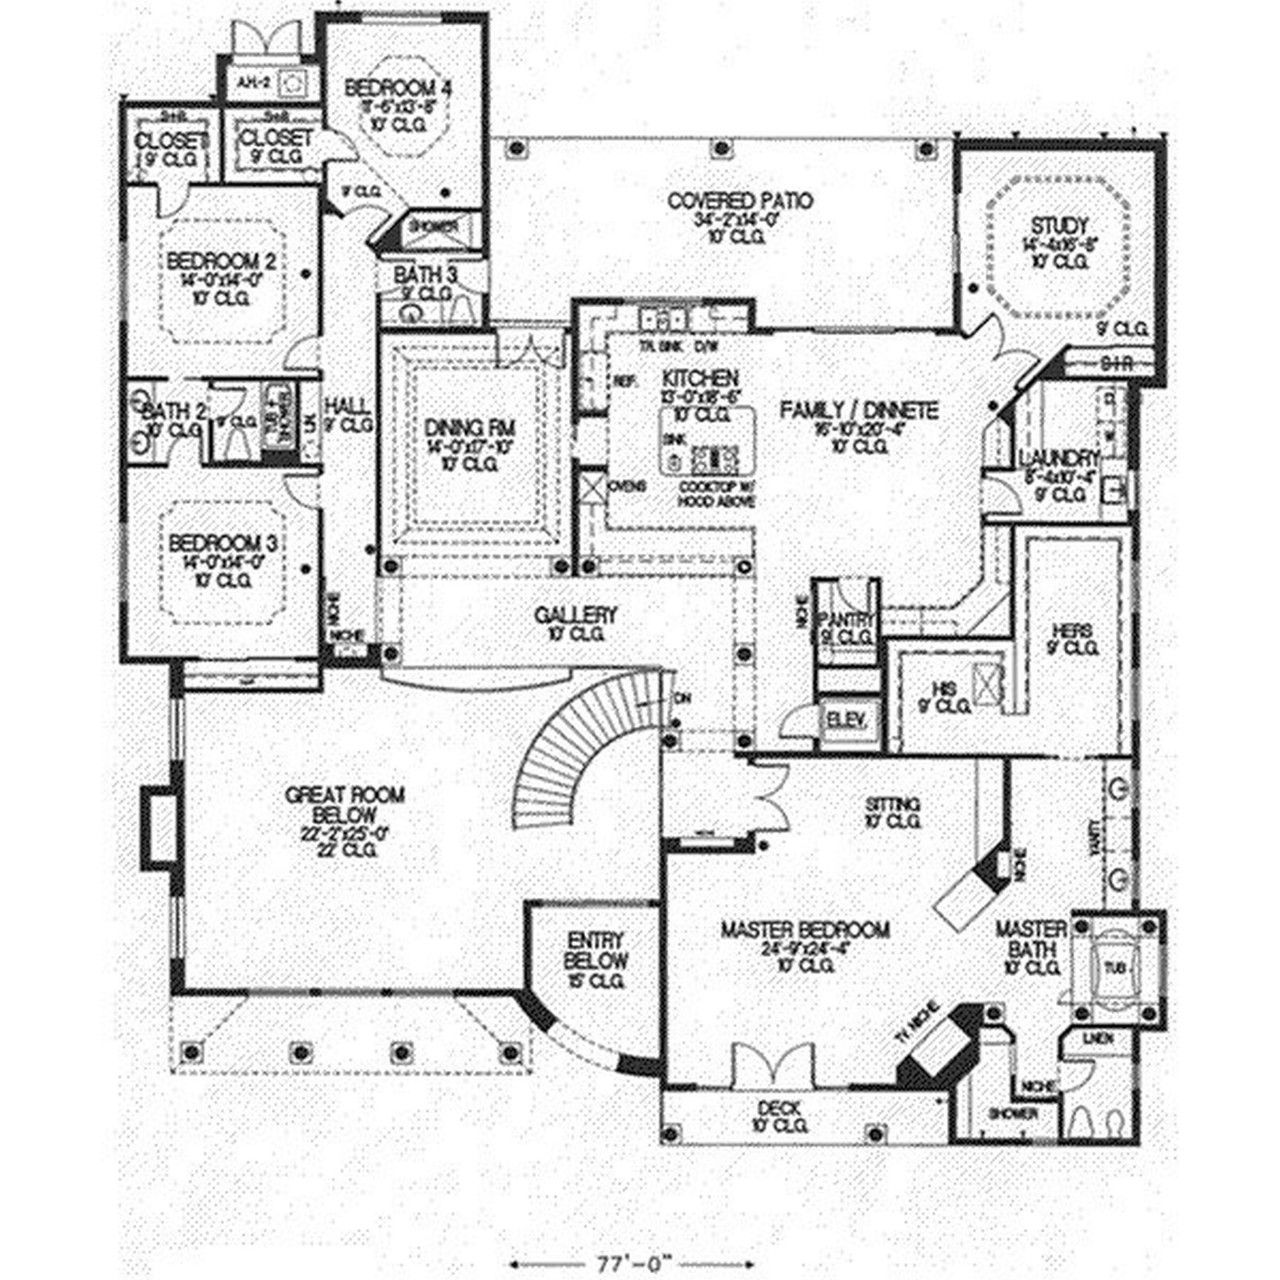 Beautiful Minimalist House Plans Plan Gorgeous Penthouse Design Remarkable Utensils Disposition 5 Dream House Drawing Beach House Floor Plans Best House Plans